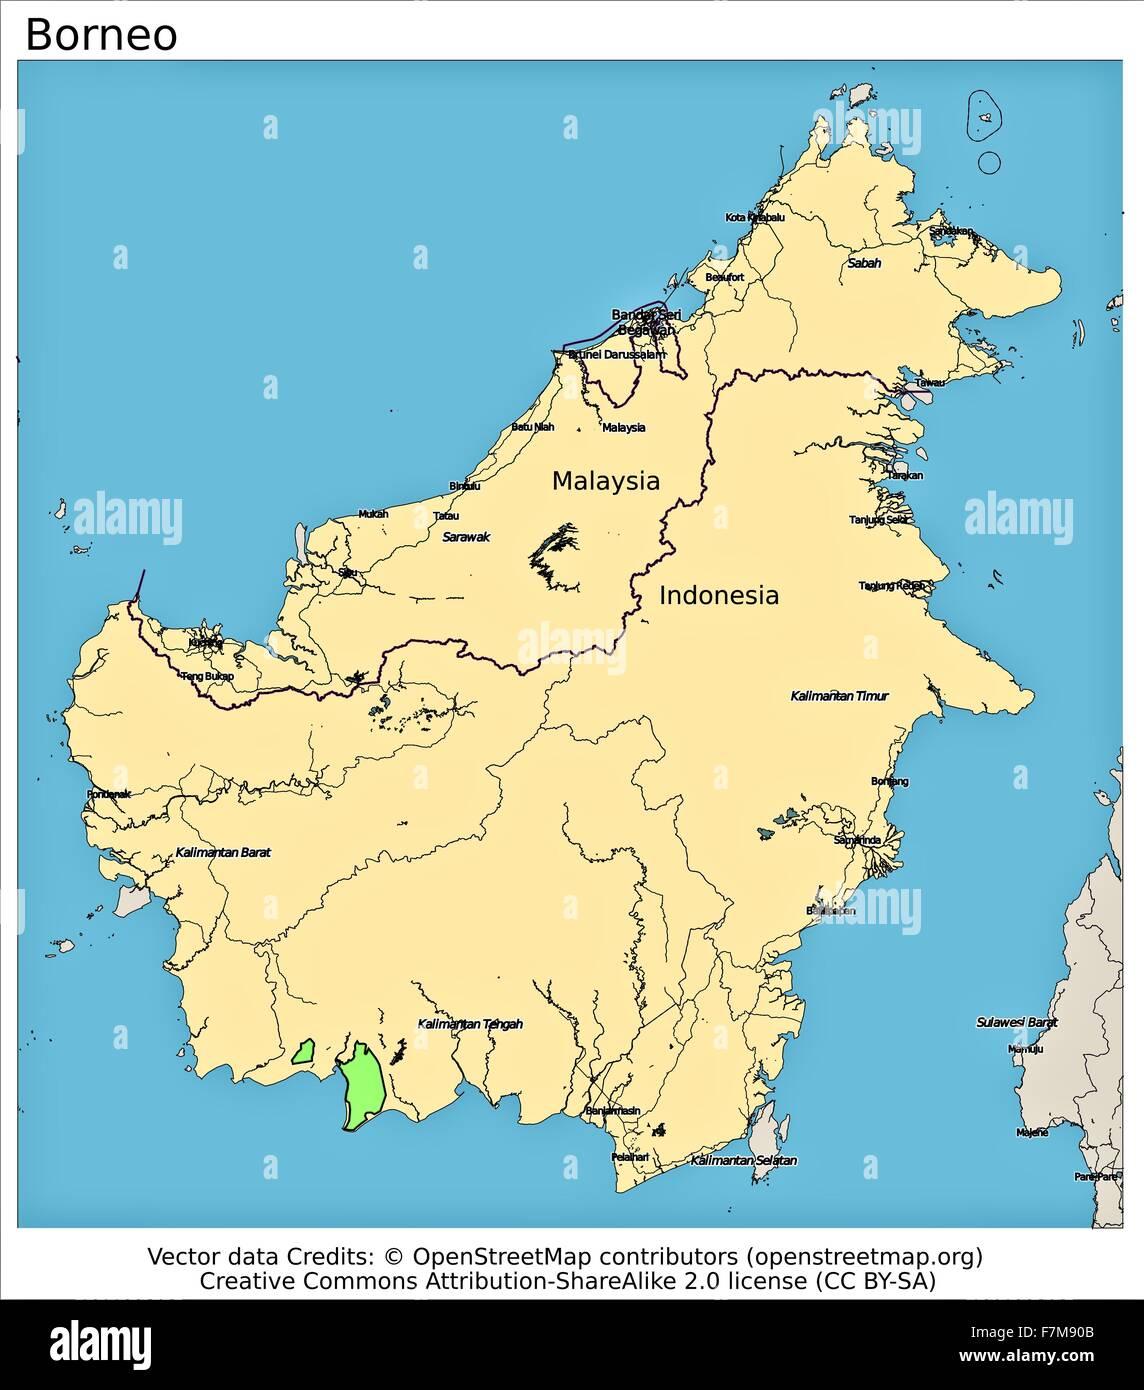 Borneo Island: Map Of Borneo Stock Photos & Map Of Borneo Stock Images